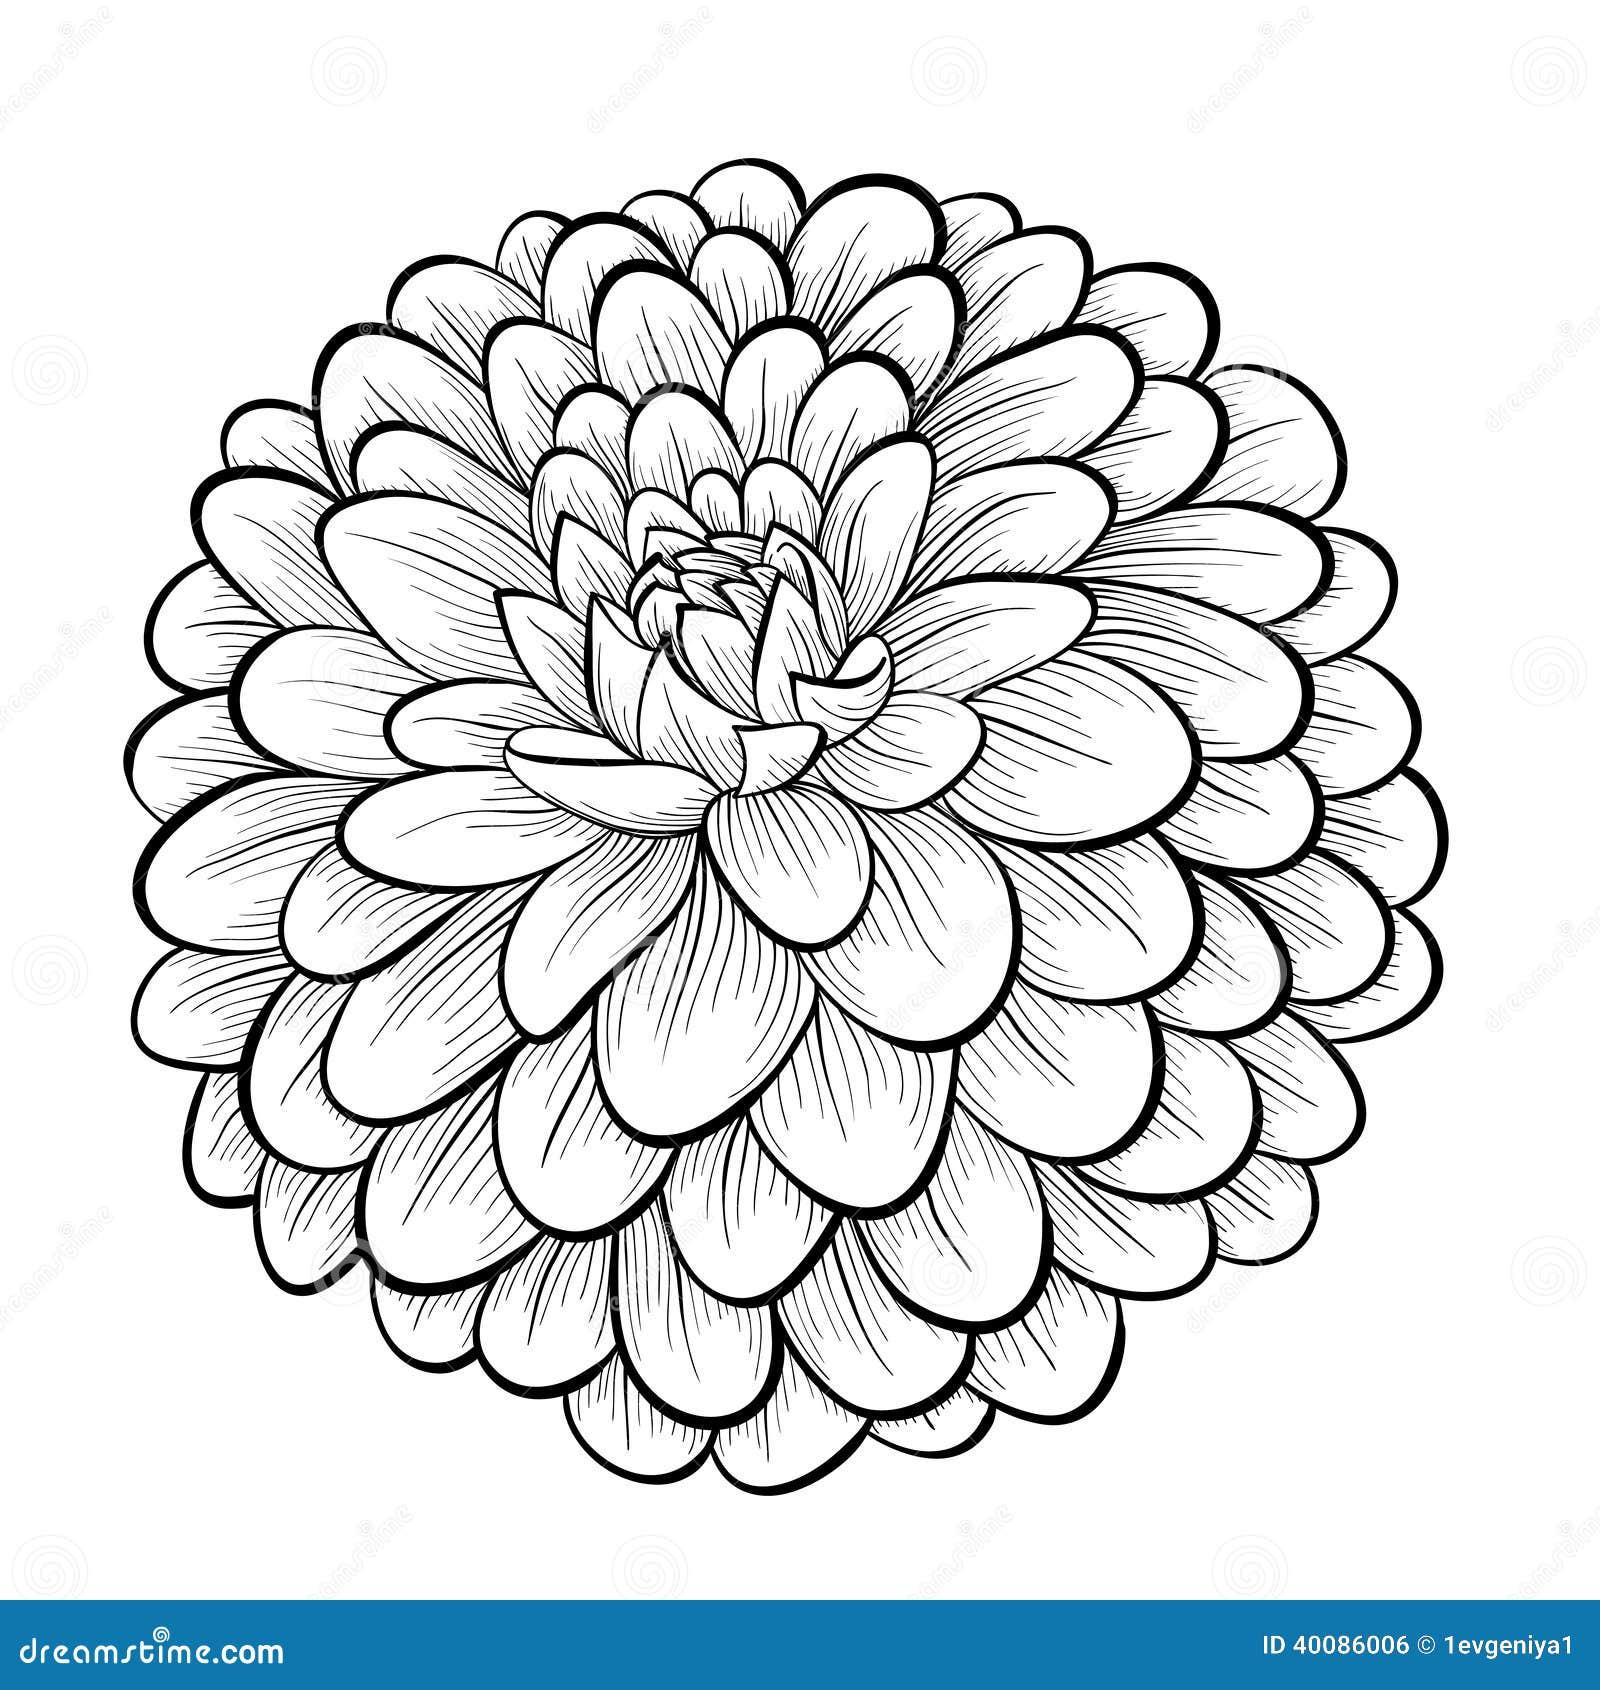 Beautiful Flower Line Drawing : Beautiful monochrome black and white dahlia flower